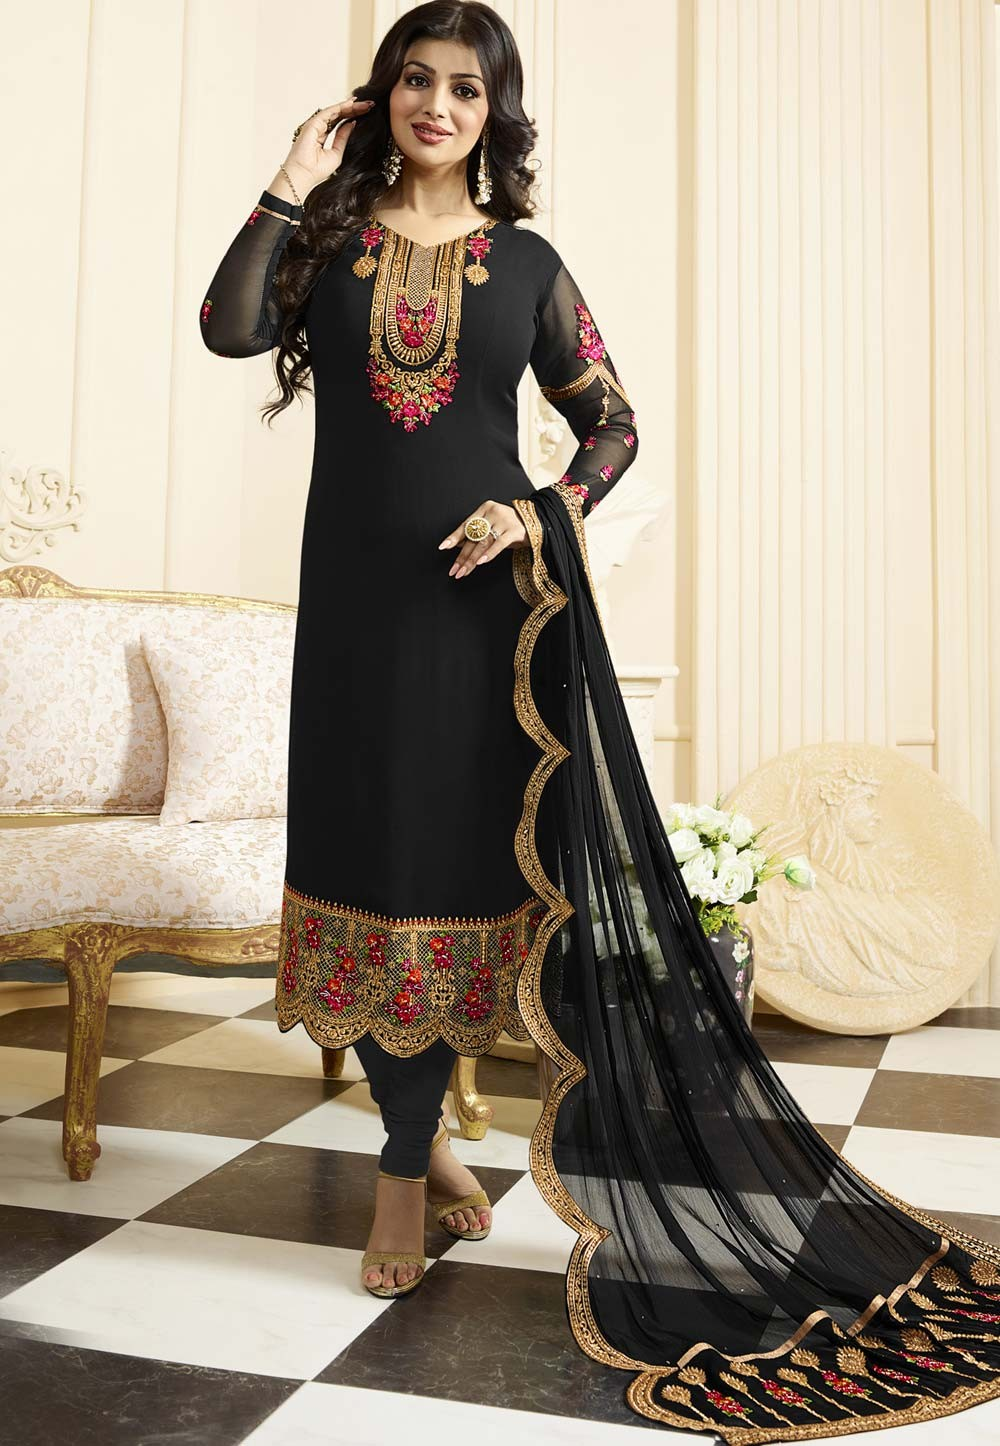 Black Color with Embroidery Work Unstitched Salwar Kameez